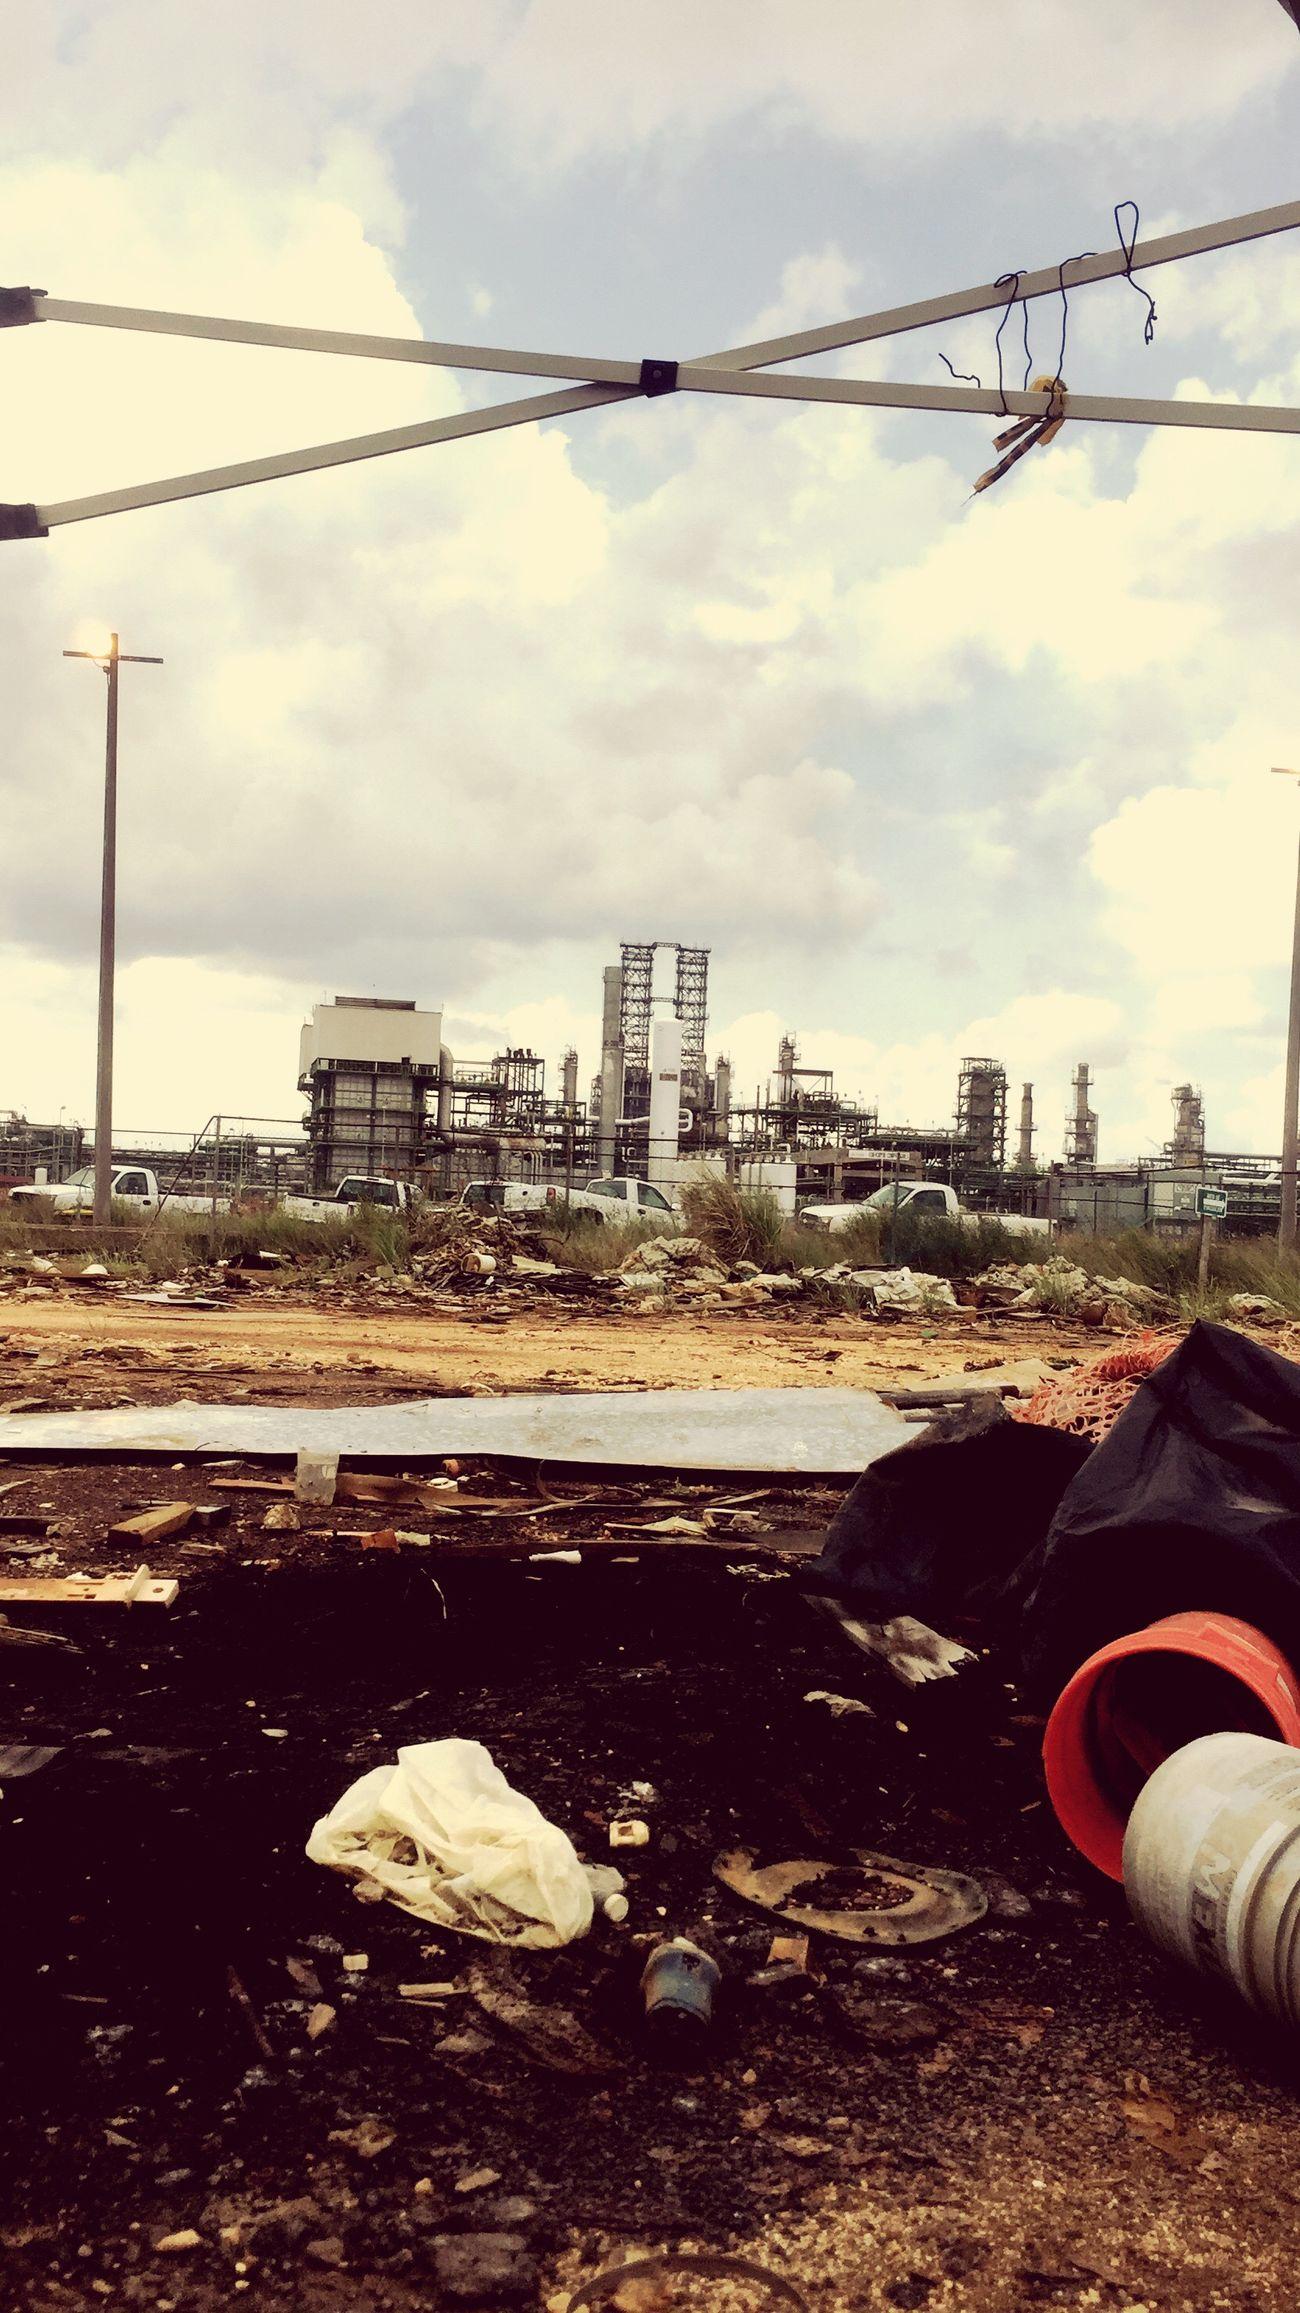 Contamination Refinery PEMEX Savetheplanet